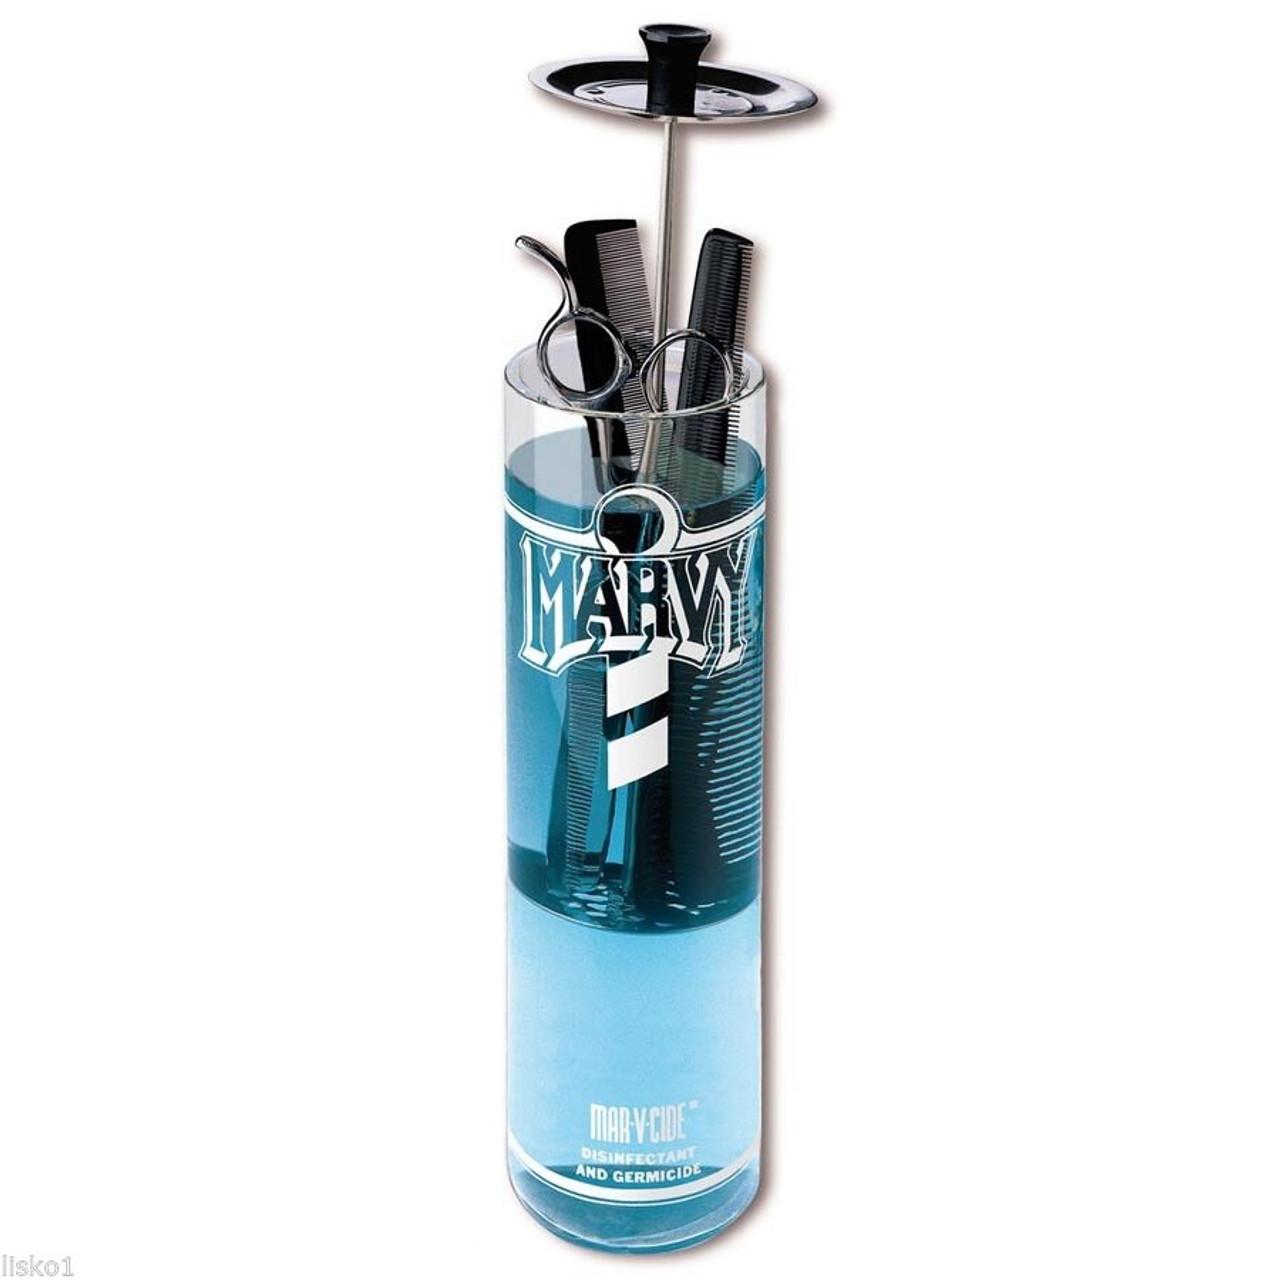 Marvy Sanitizing Jar #3